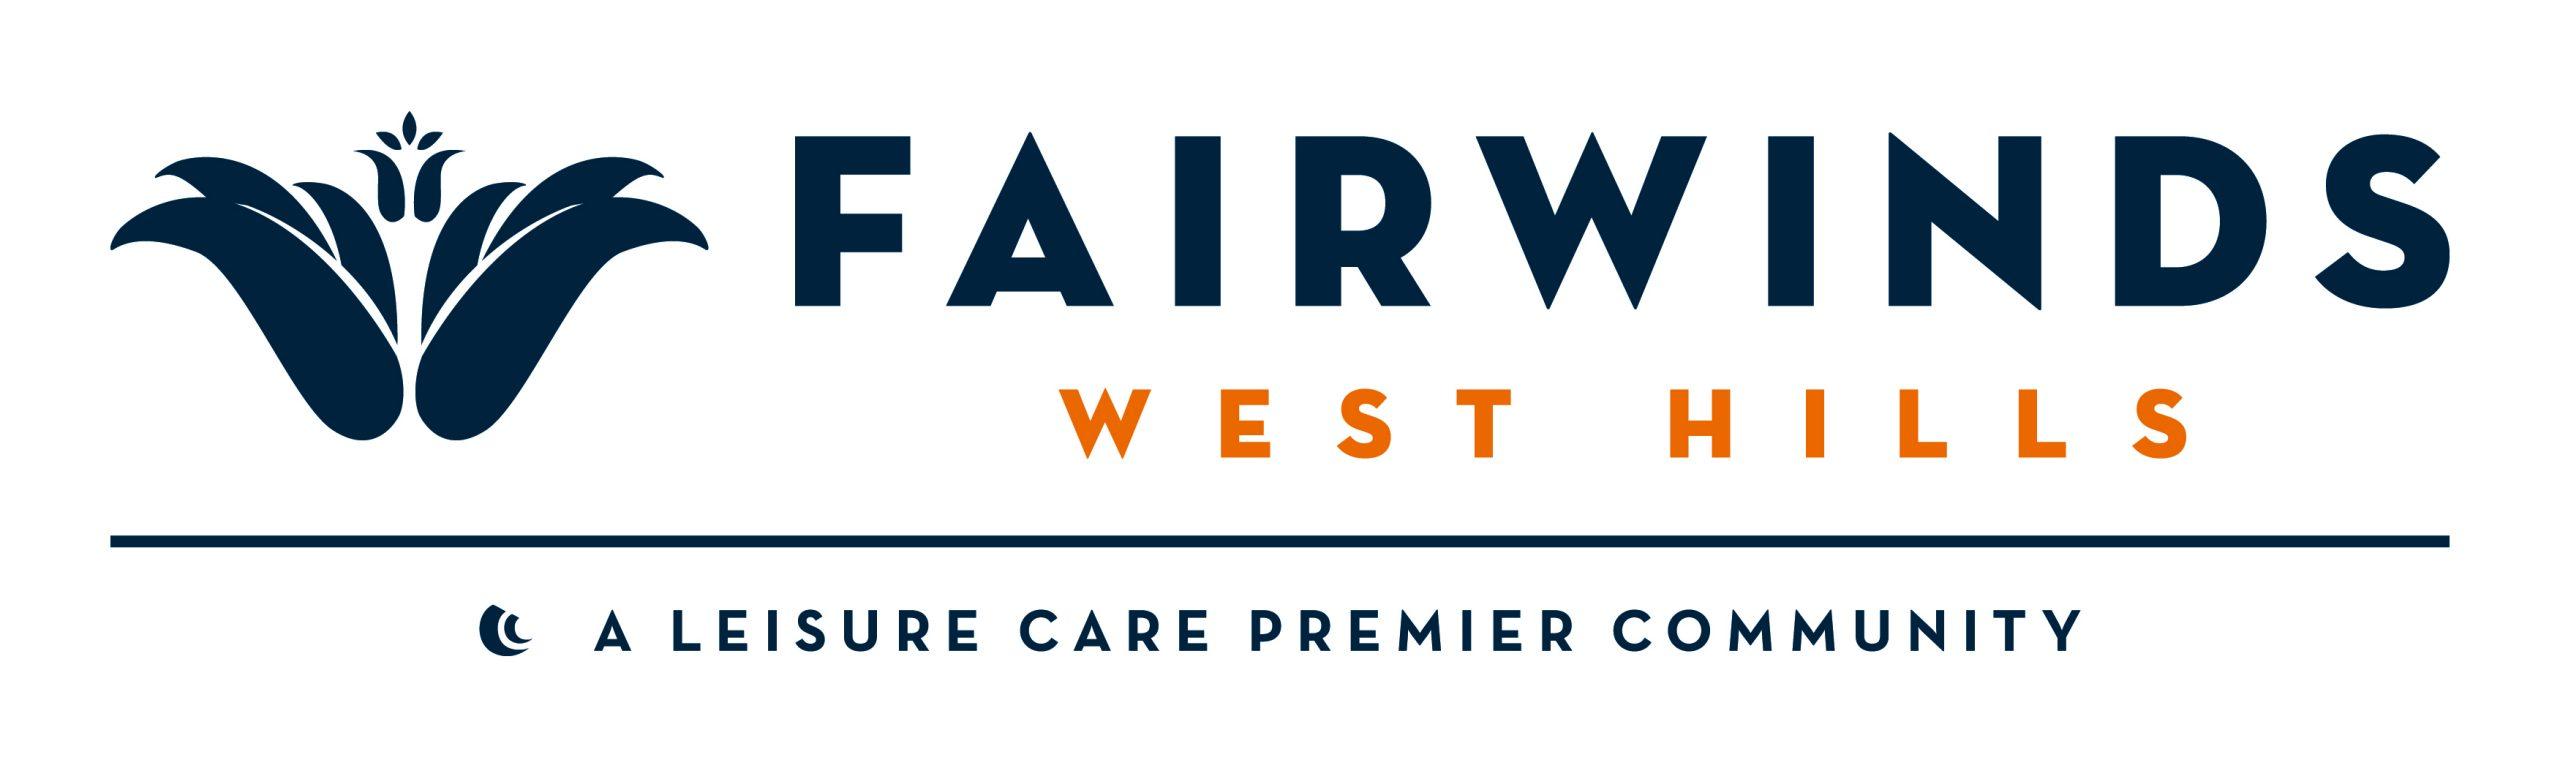 Fairwinds West Hills